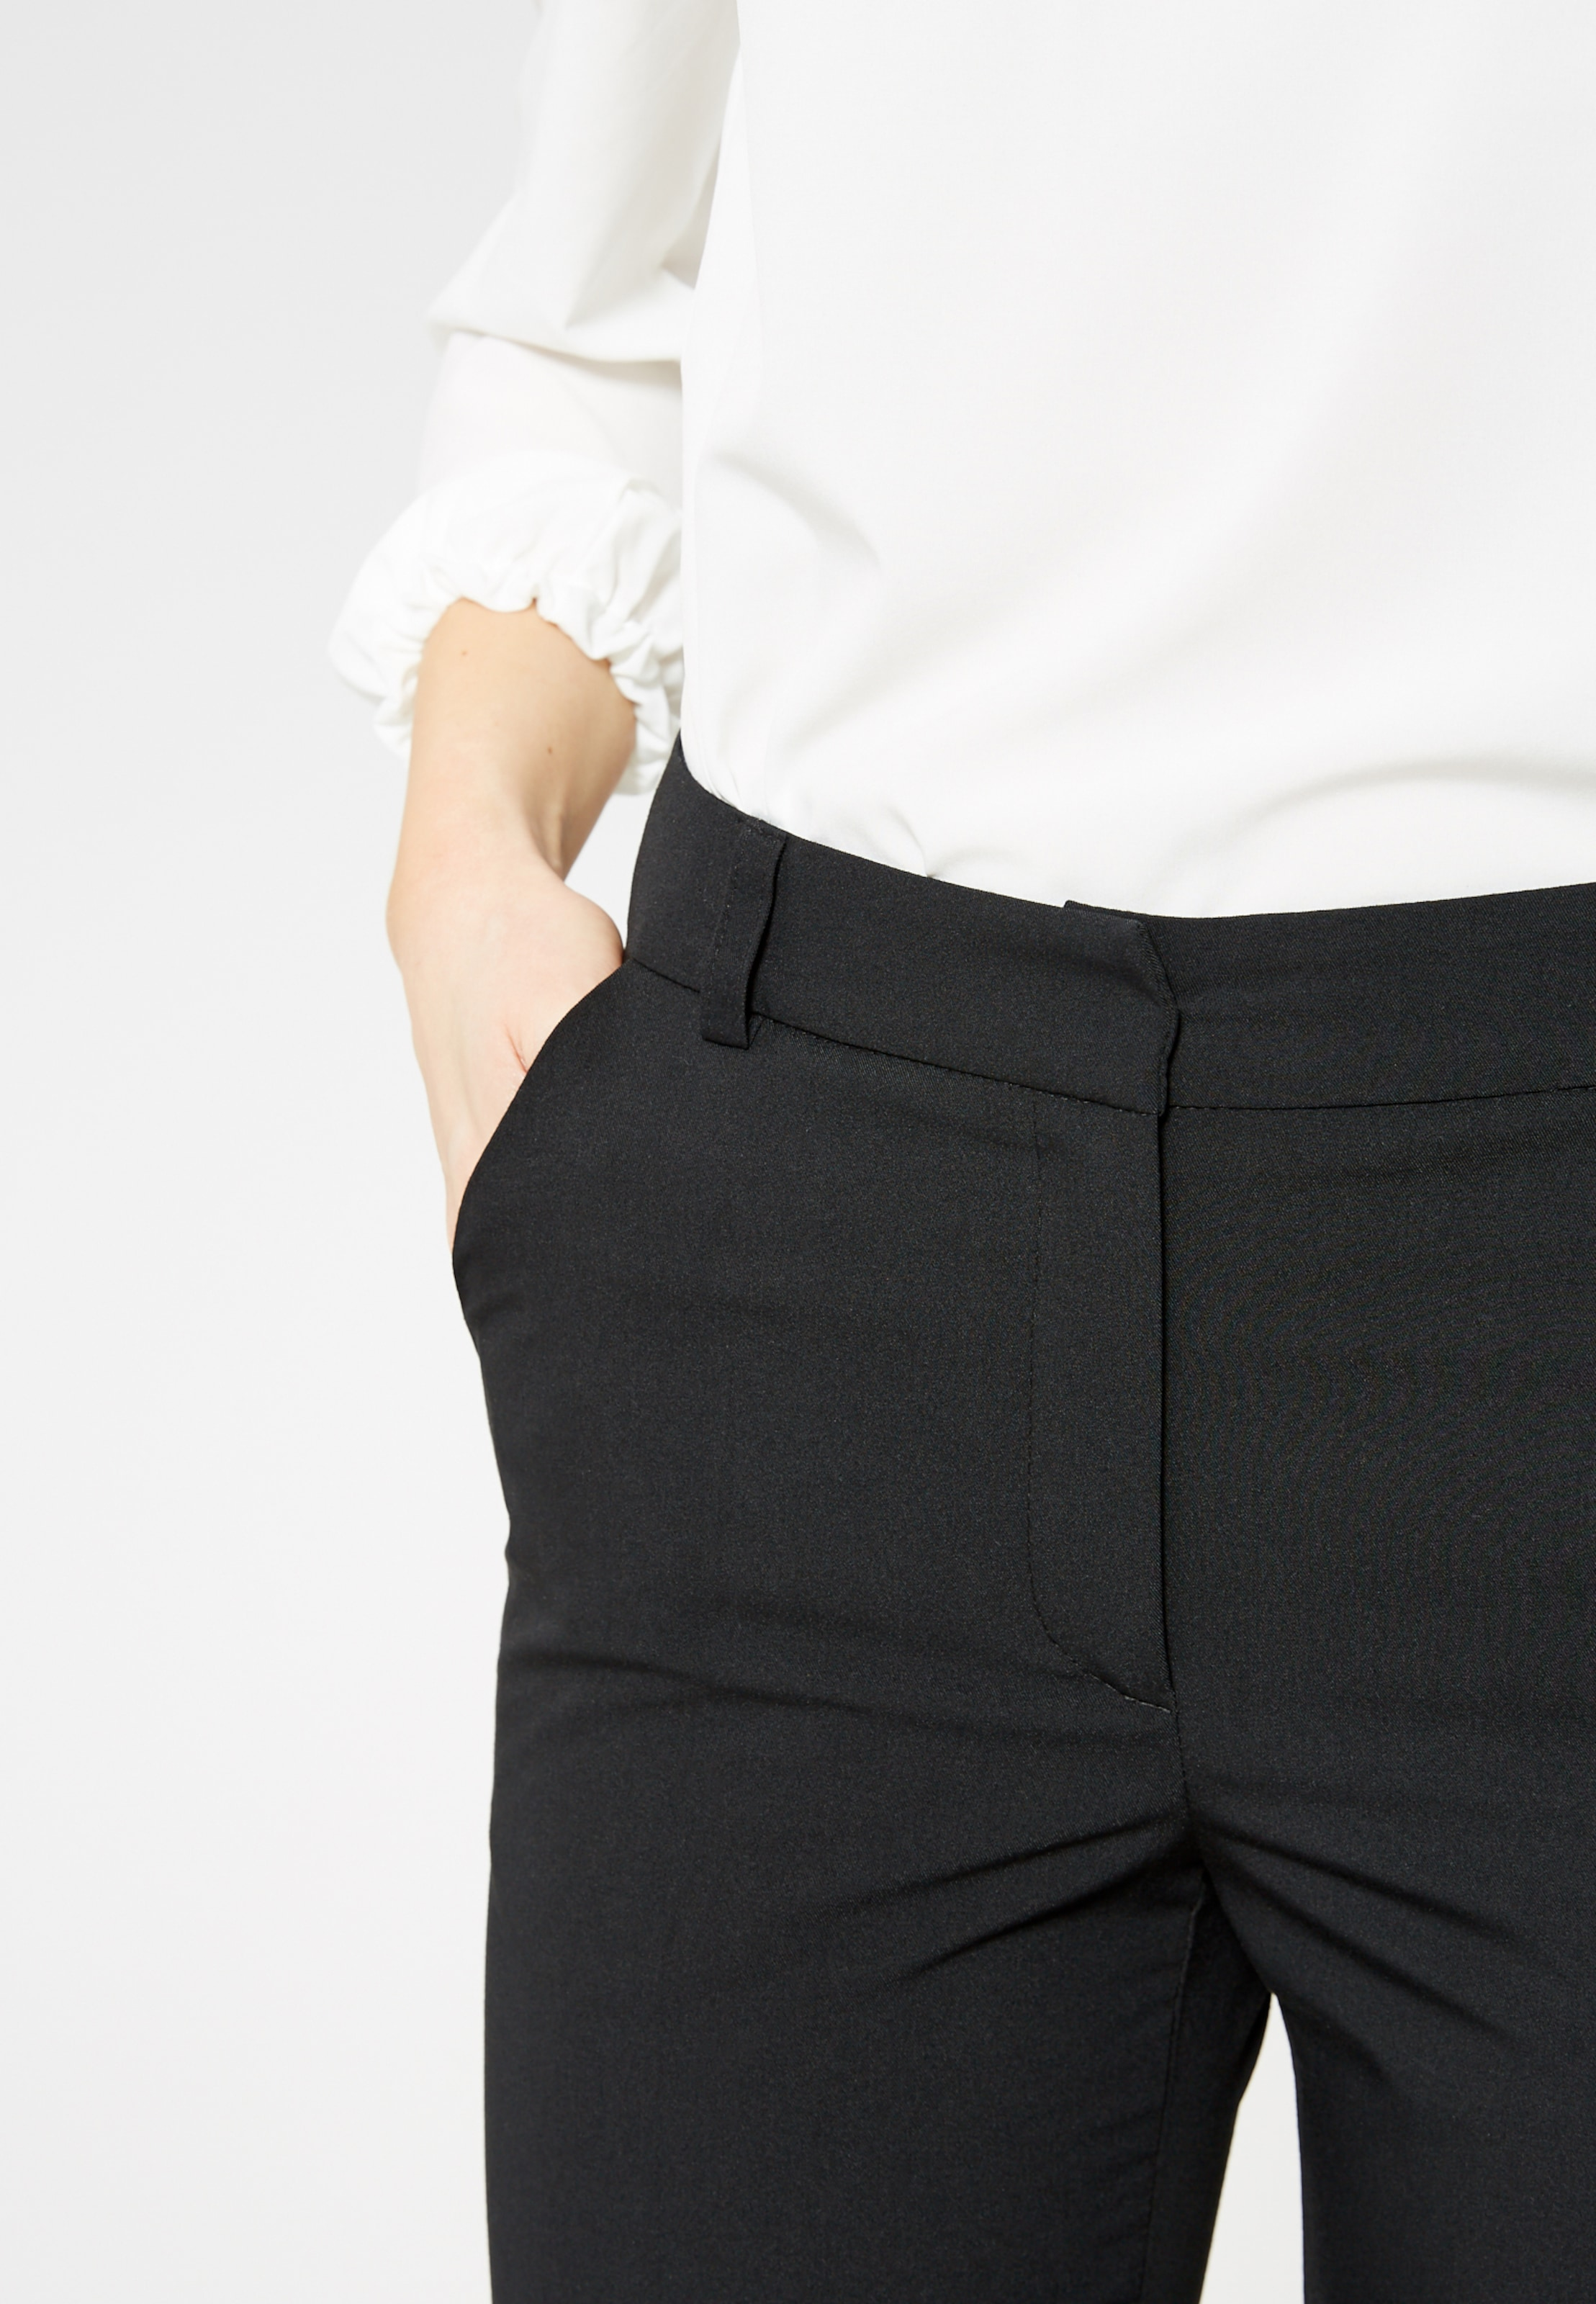 En En Usha Pantalon Usha Pantalon Pantalon Usha Pantalon Noir Usha Noir Noir En LVGMqSUzjp